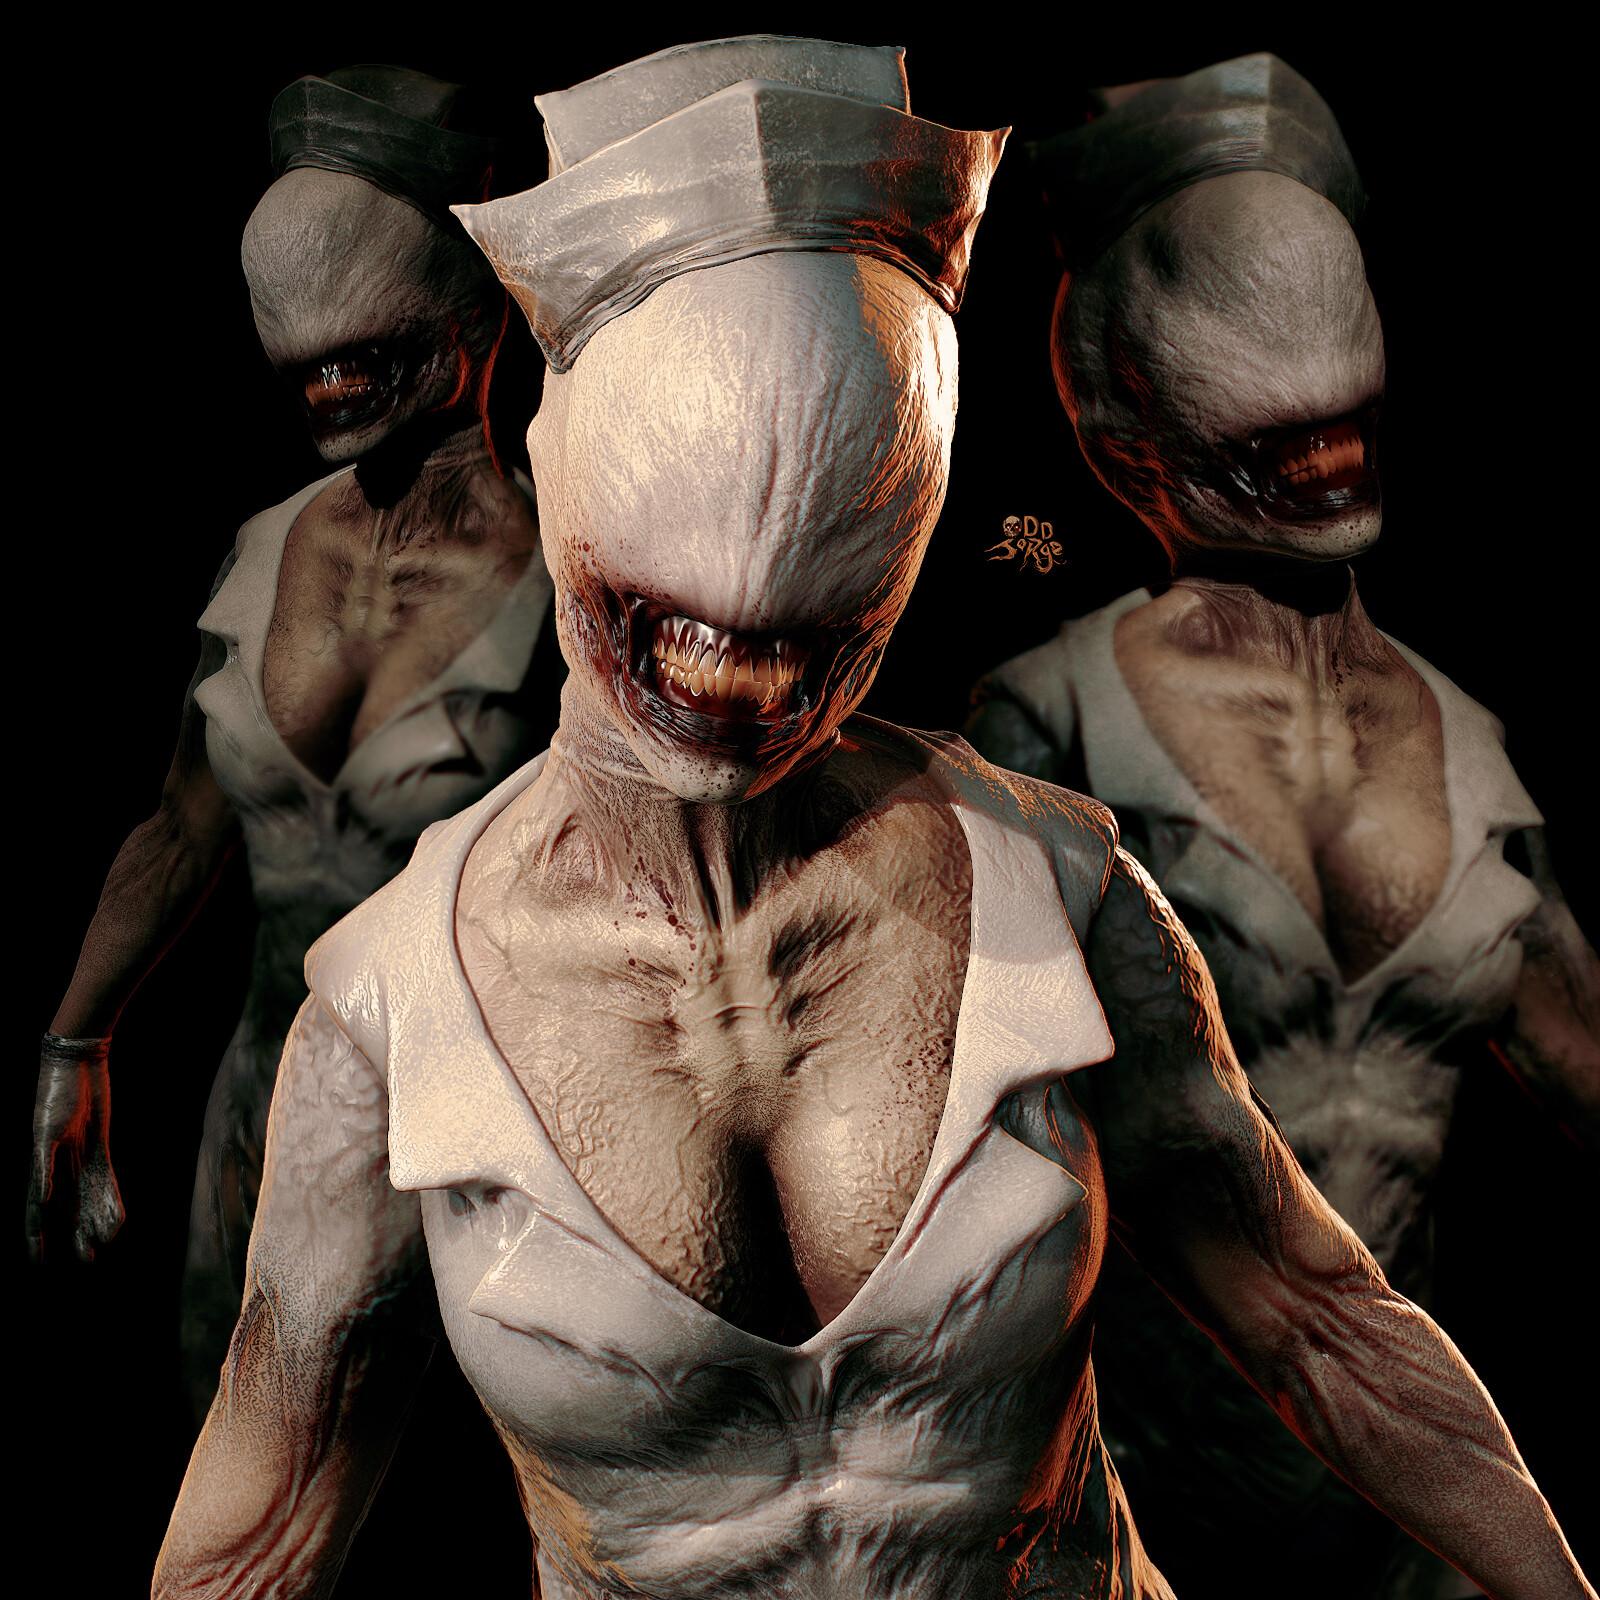 Odd Jorge Silent Hill 2 Redesign Part Iii Creatures